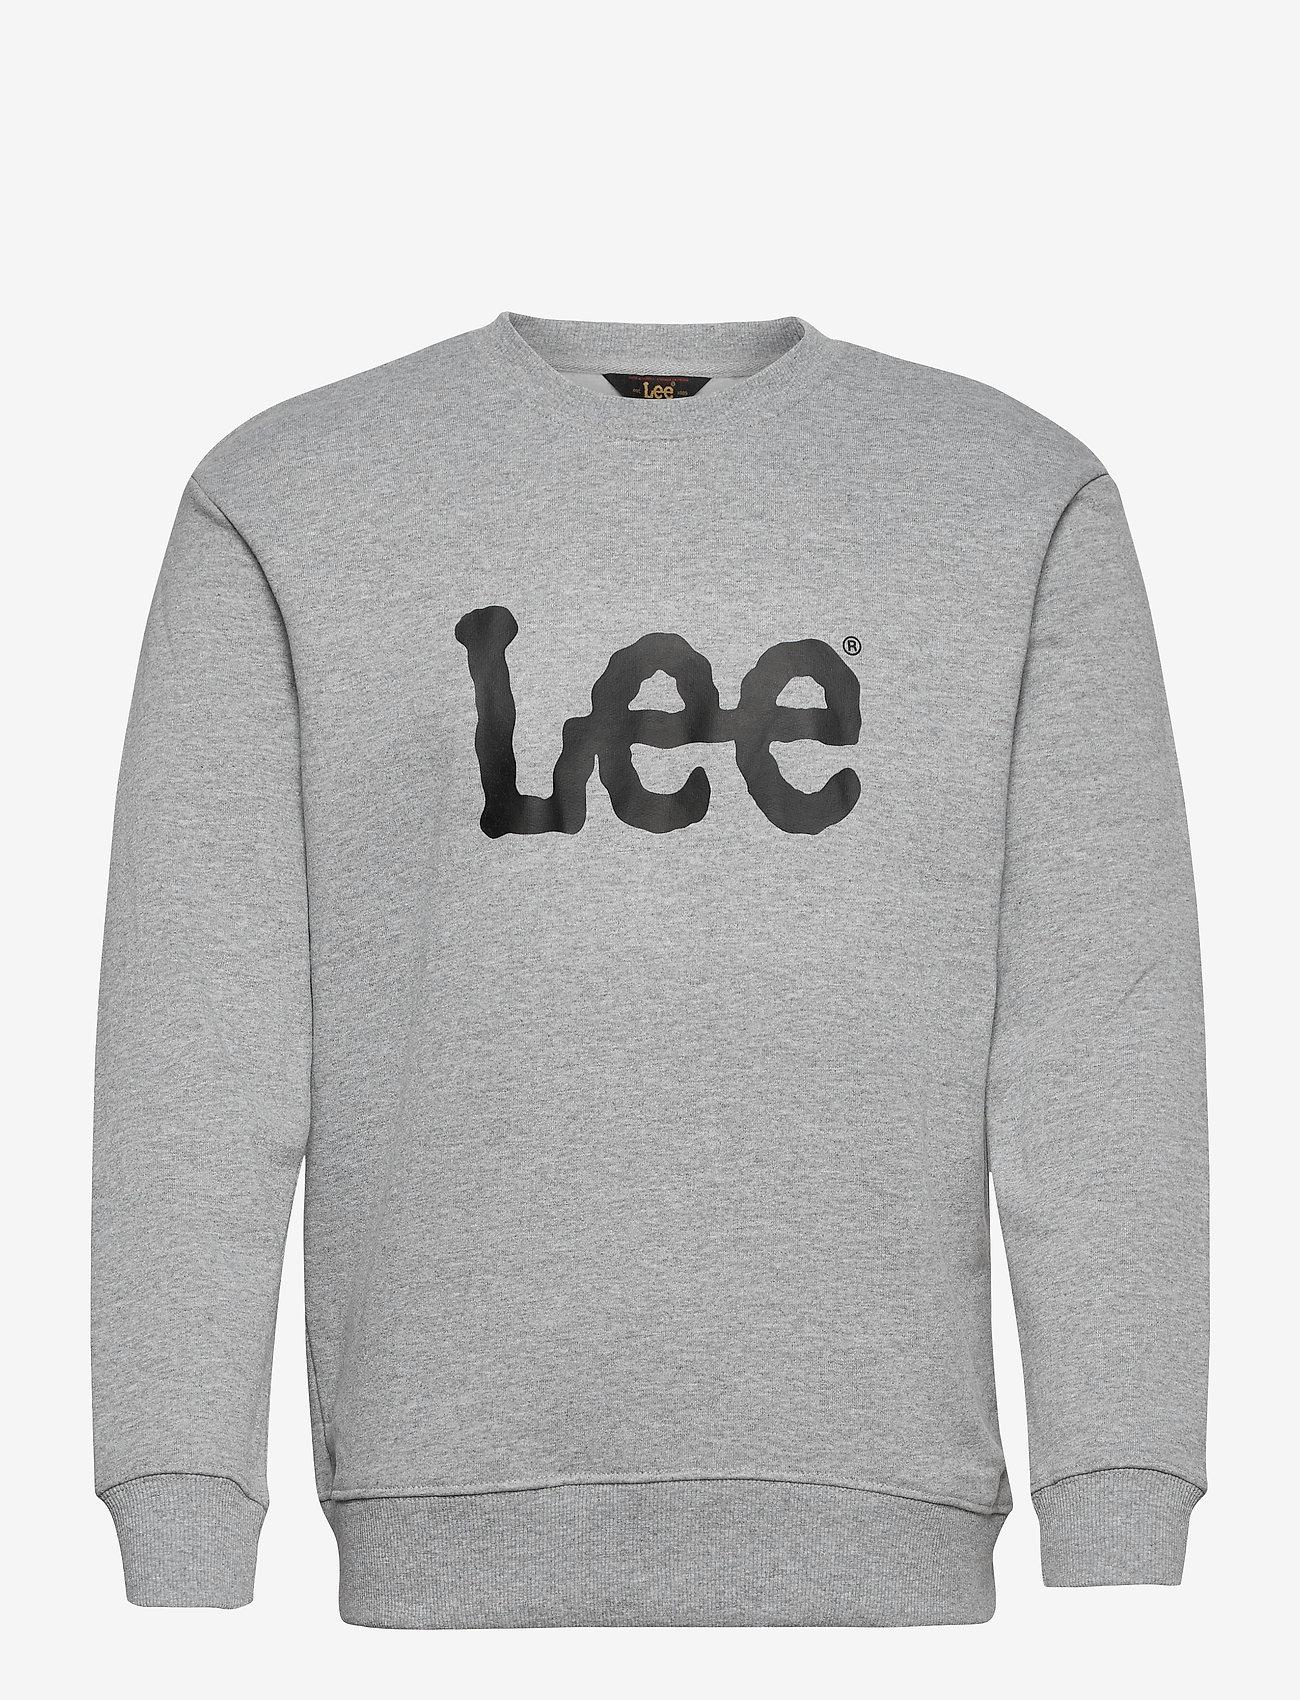 Lee Jeans - BASIC CREW LOGO SWS - tops - grey mele - 0